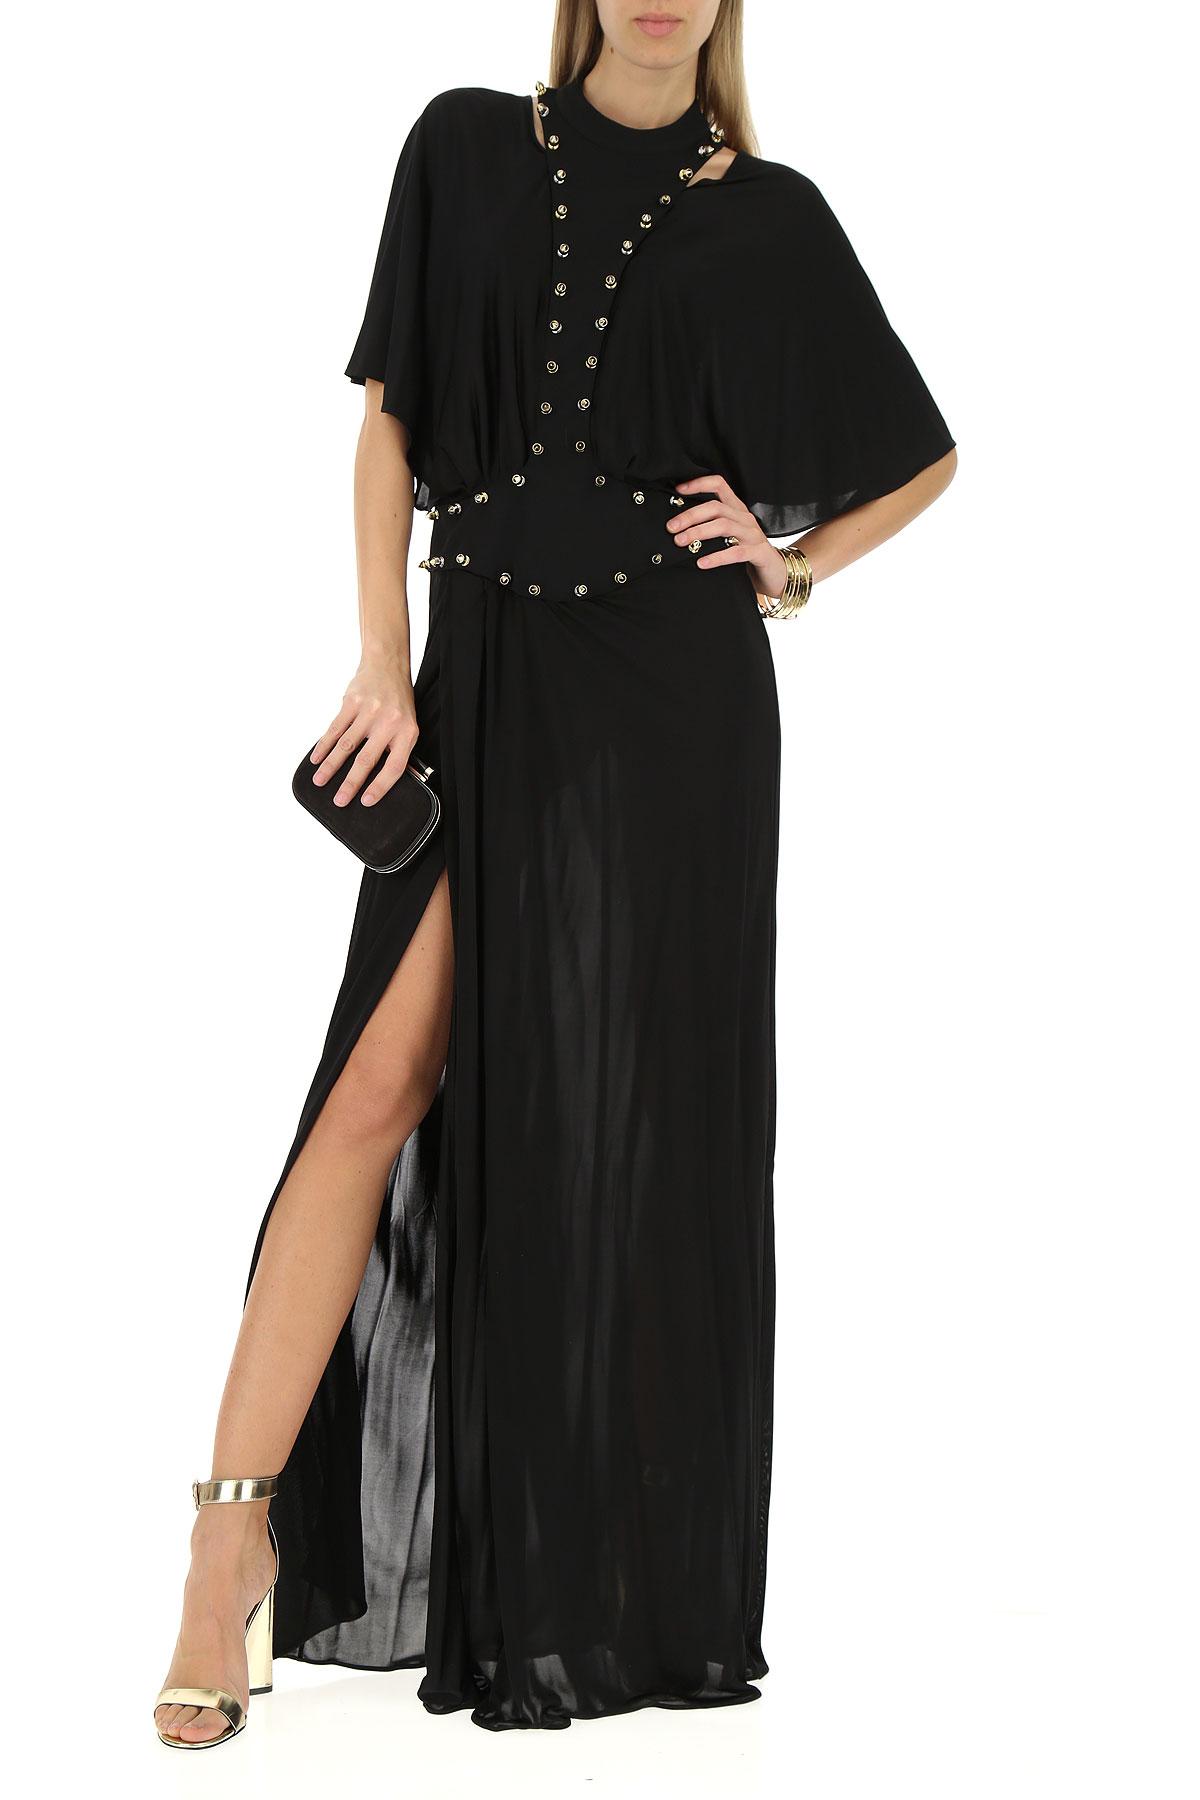 Ropa Primavera Mujer 2019 Para Versace Negro verano nbsp; z7qTqFwx